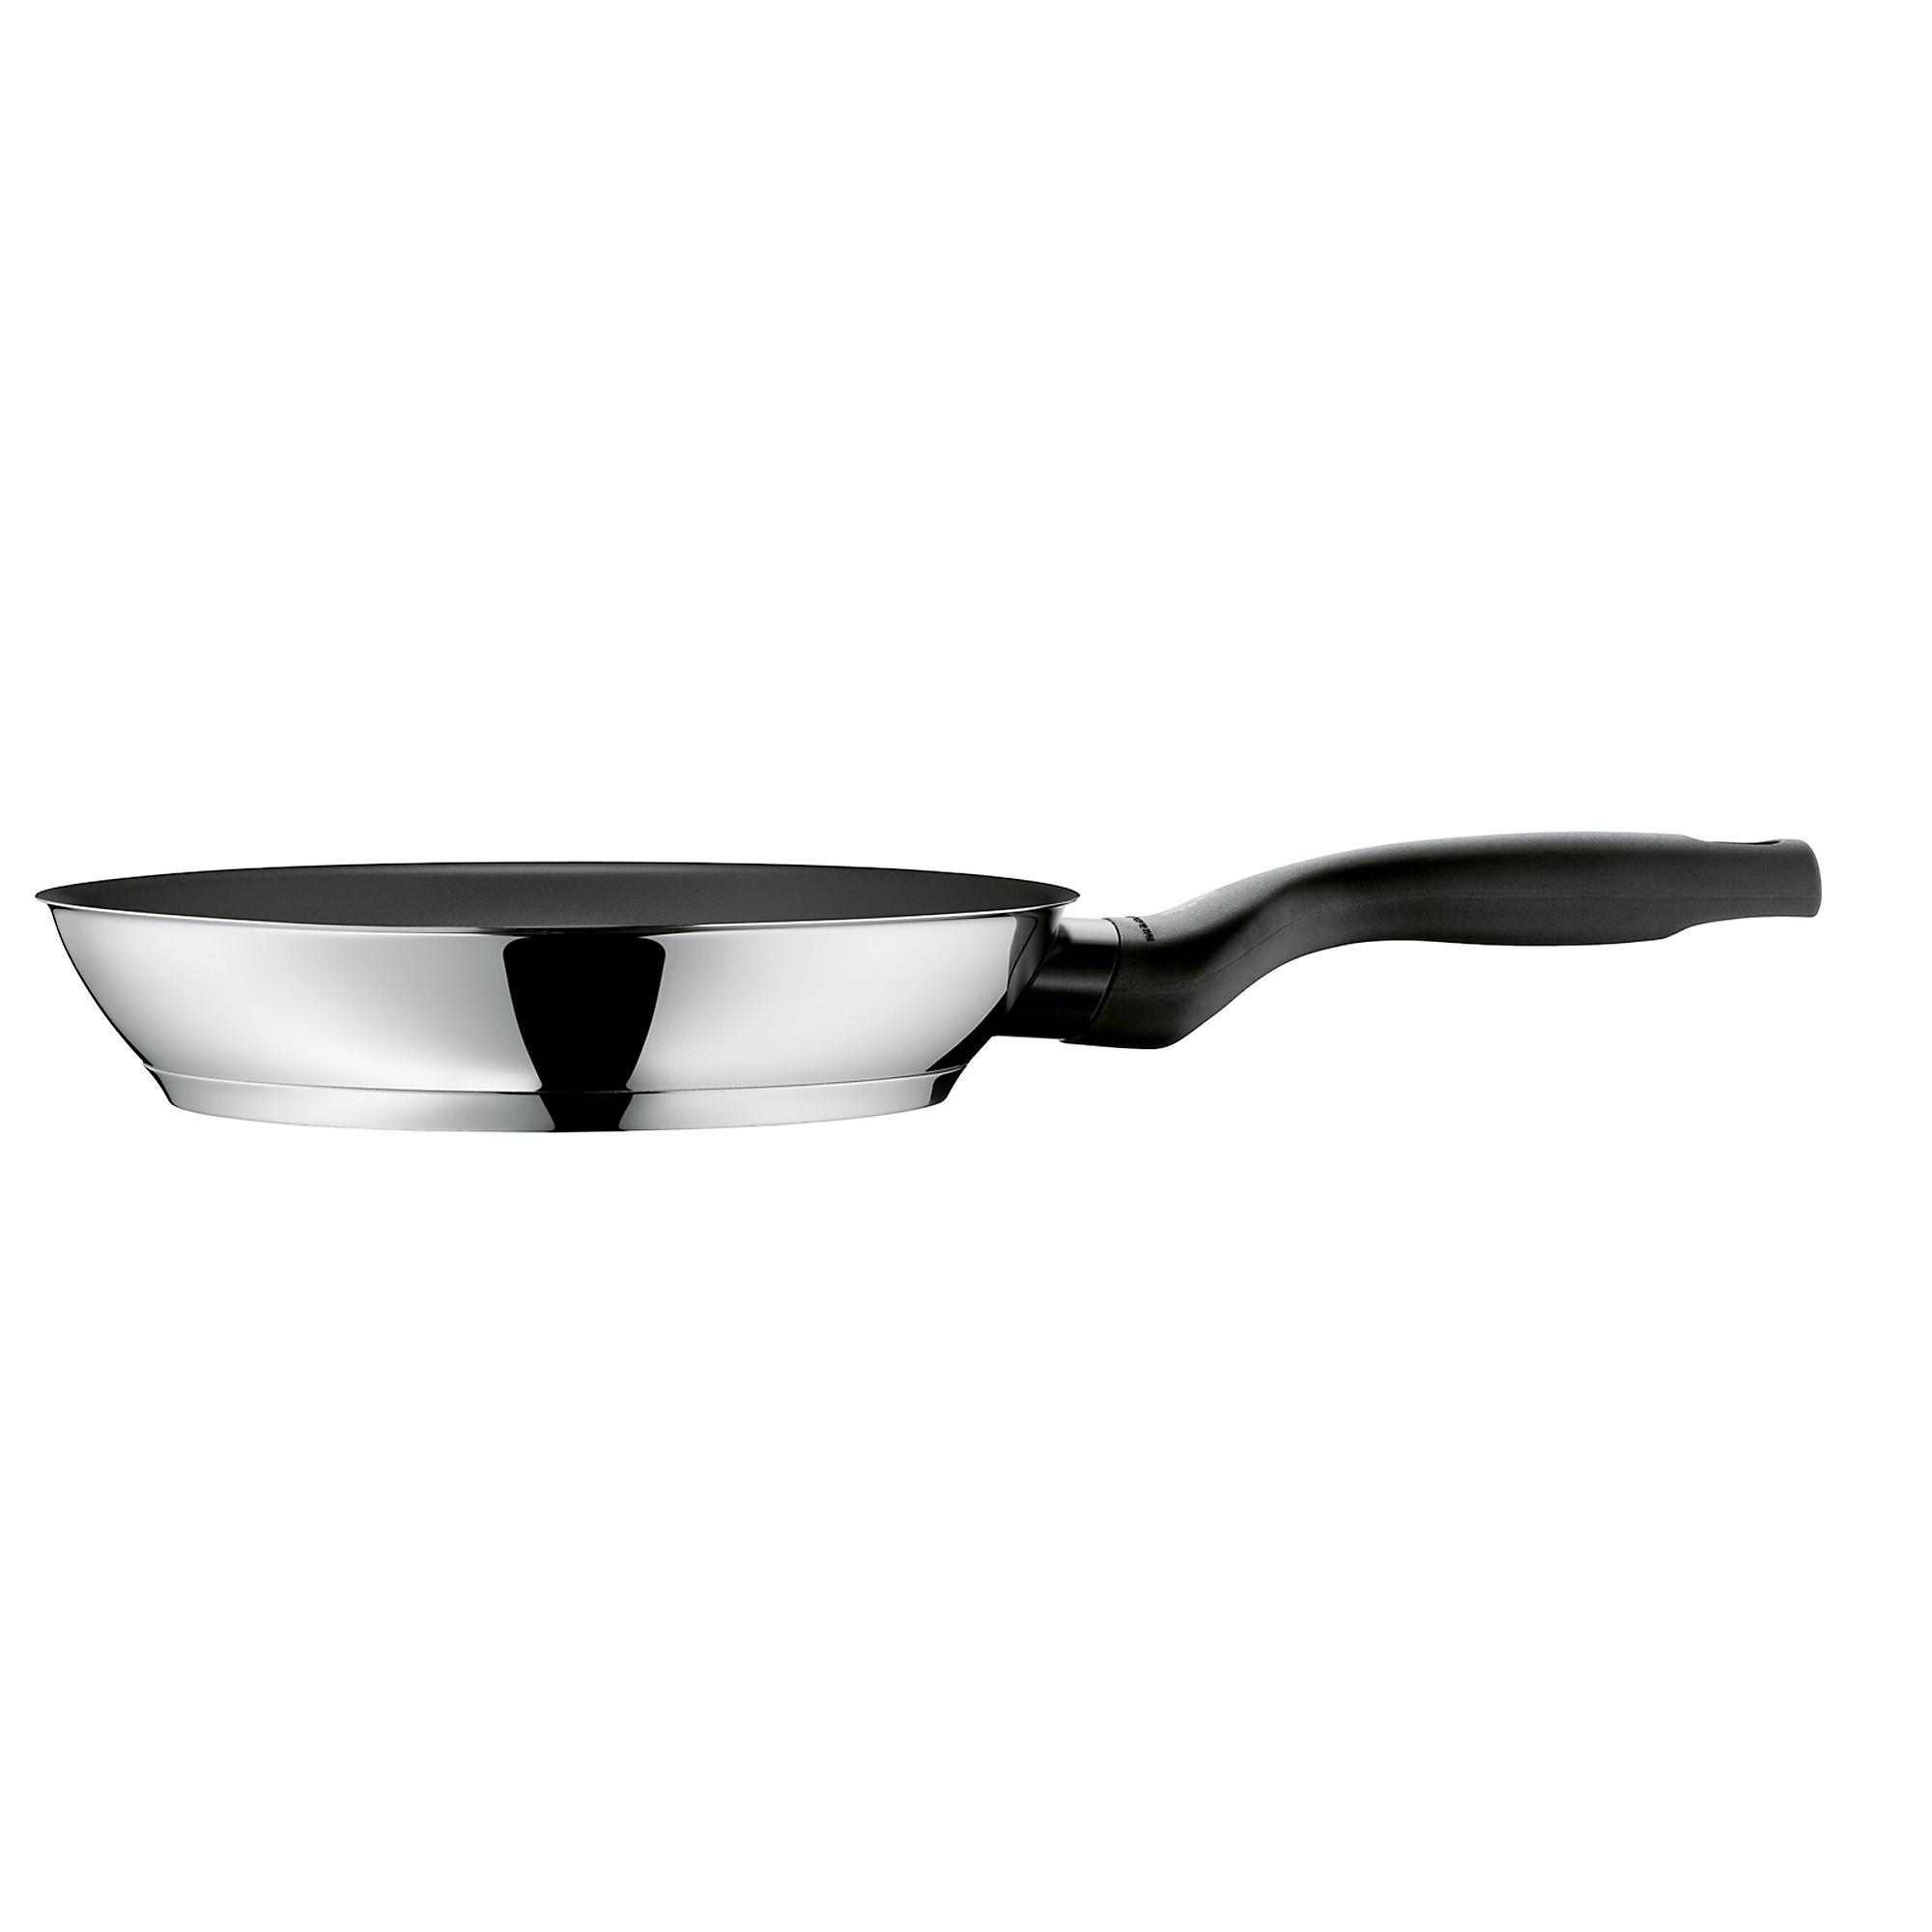 PFANNE 28 cm CeraDur Profi - Edelstahlfarben, Basics, Keramik/Metall (28cm) - WMF